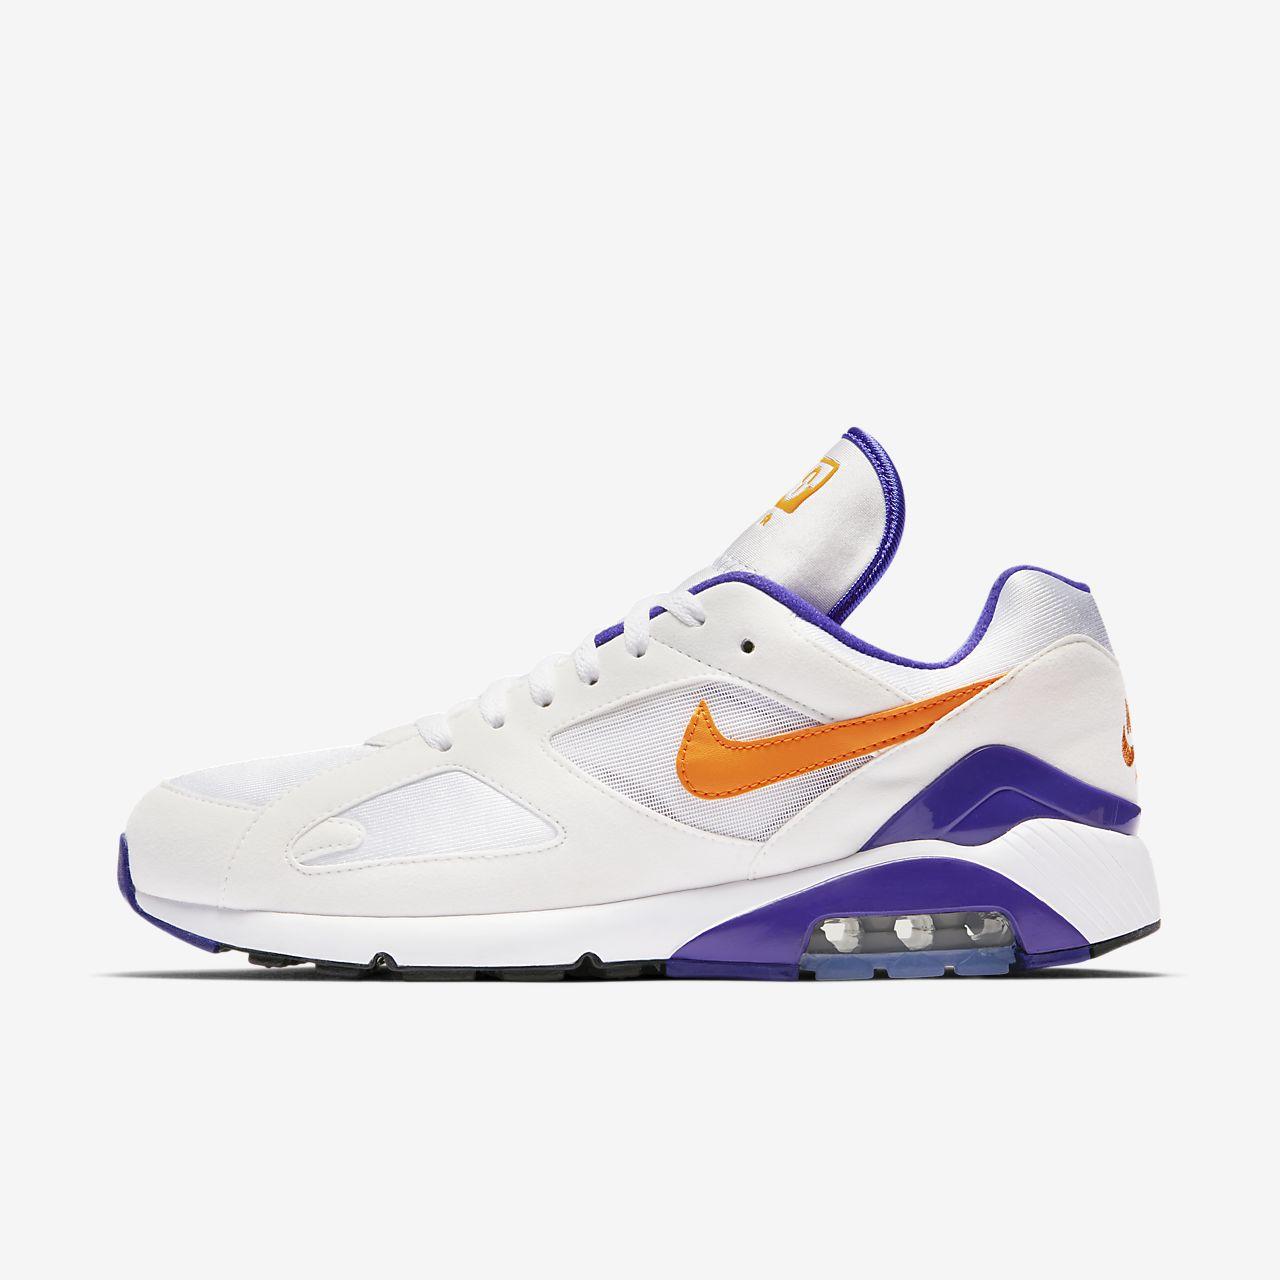 Mens Nike Air Max 180 Light Purple Shoe Loved Around